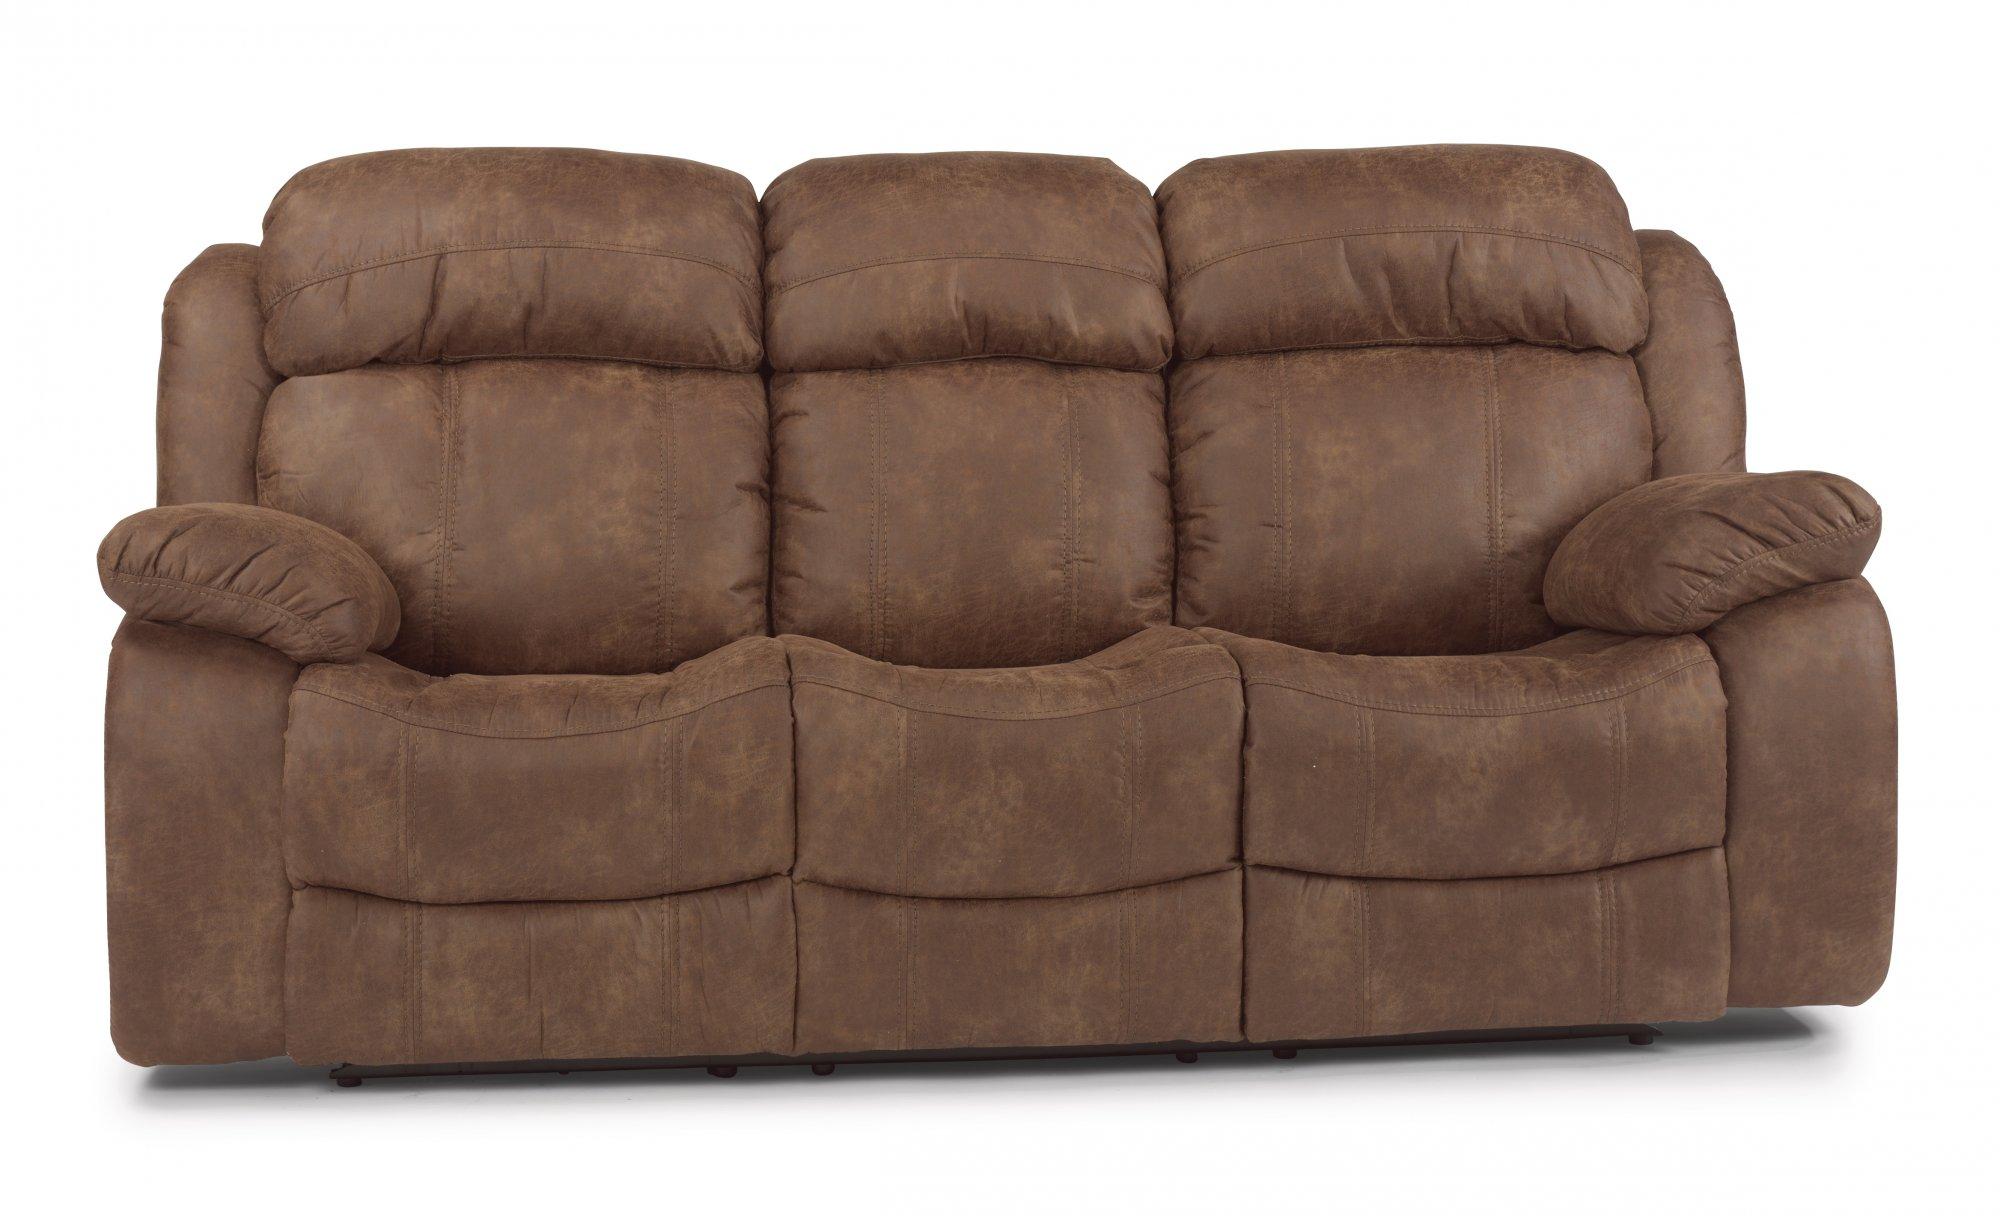 o Fabric Reclining Sofa Fabric Sofa Recliner